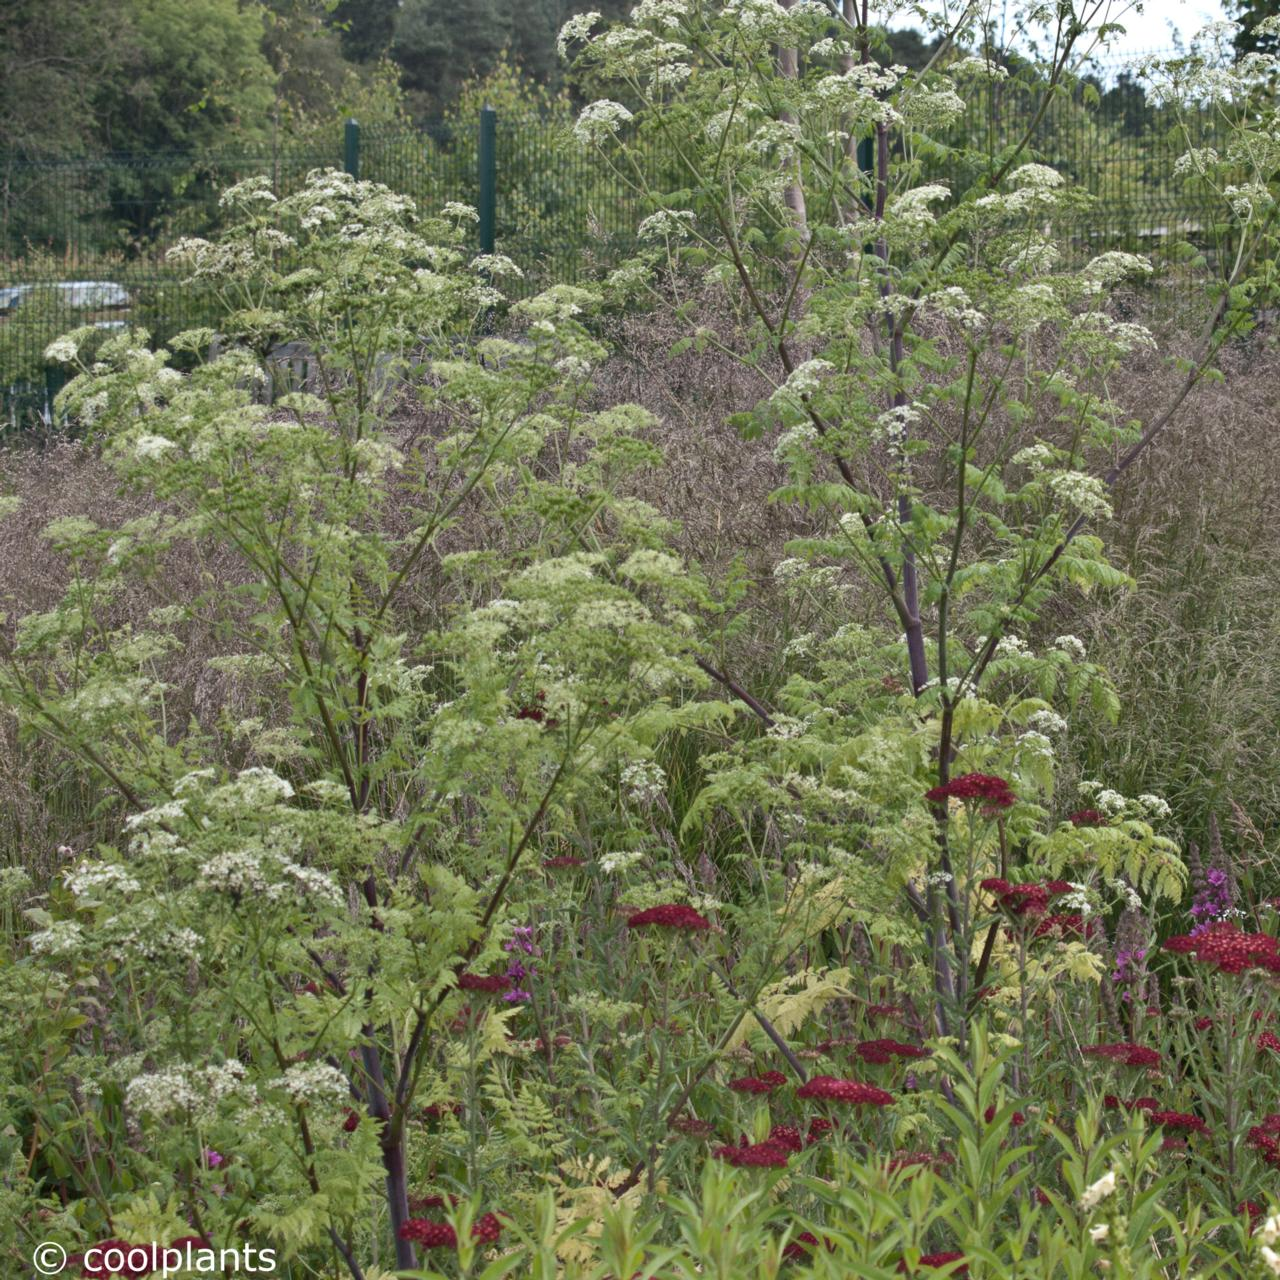 Seseli libanotis plant